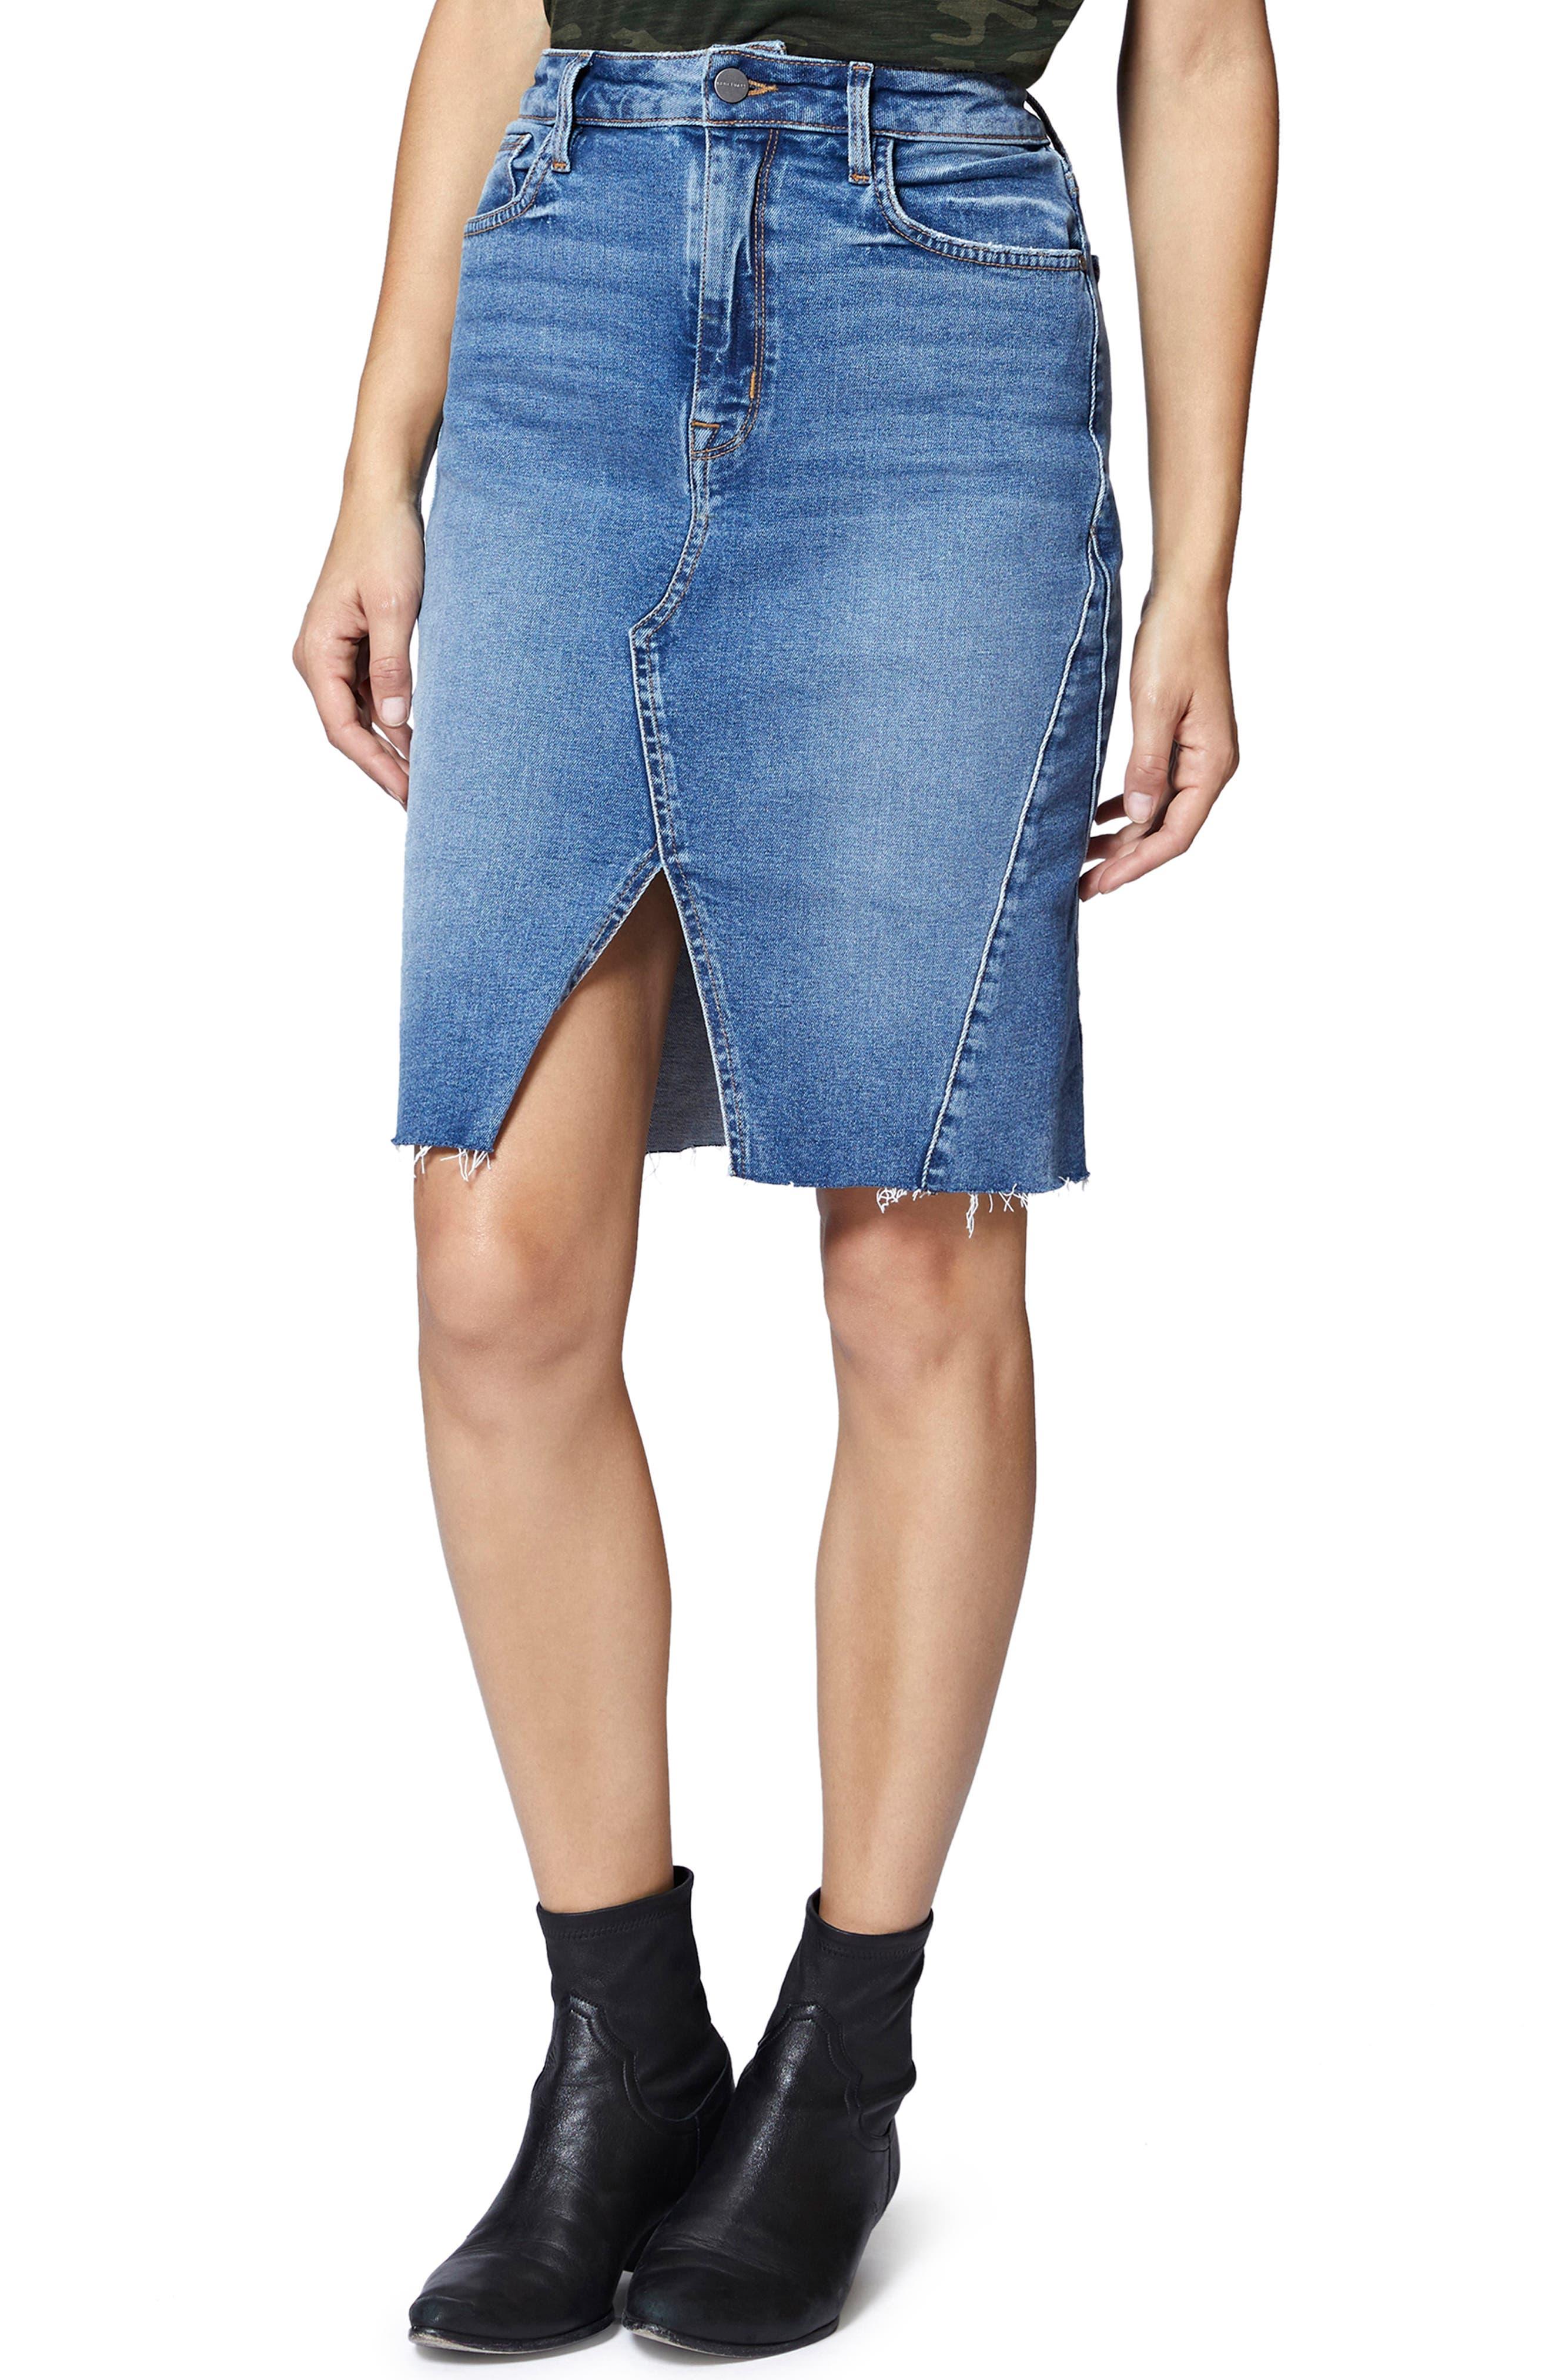 Sia A-Line Denim Skirt,                             Alternate thumbnail 4, color,                             FLAT IRON RIGID